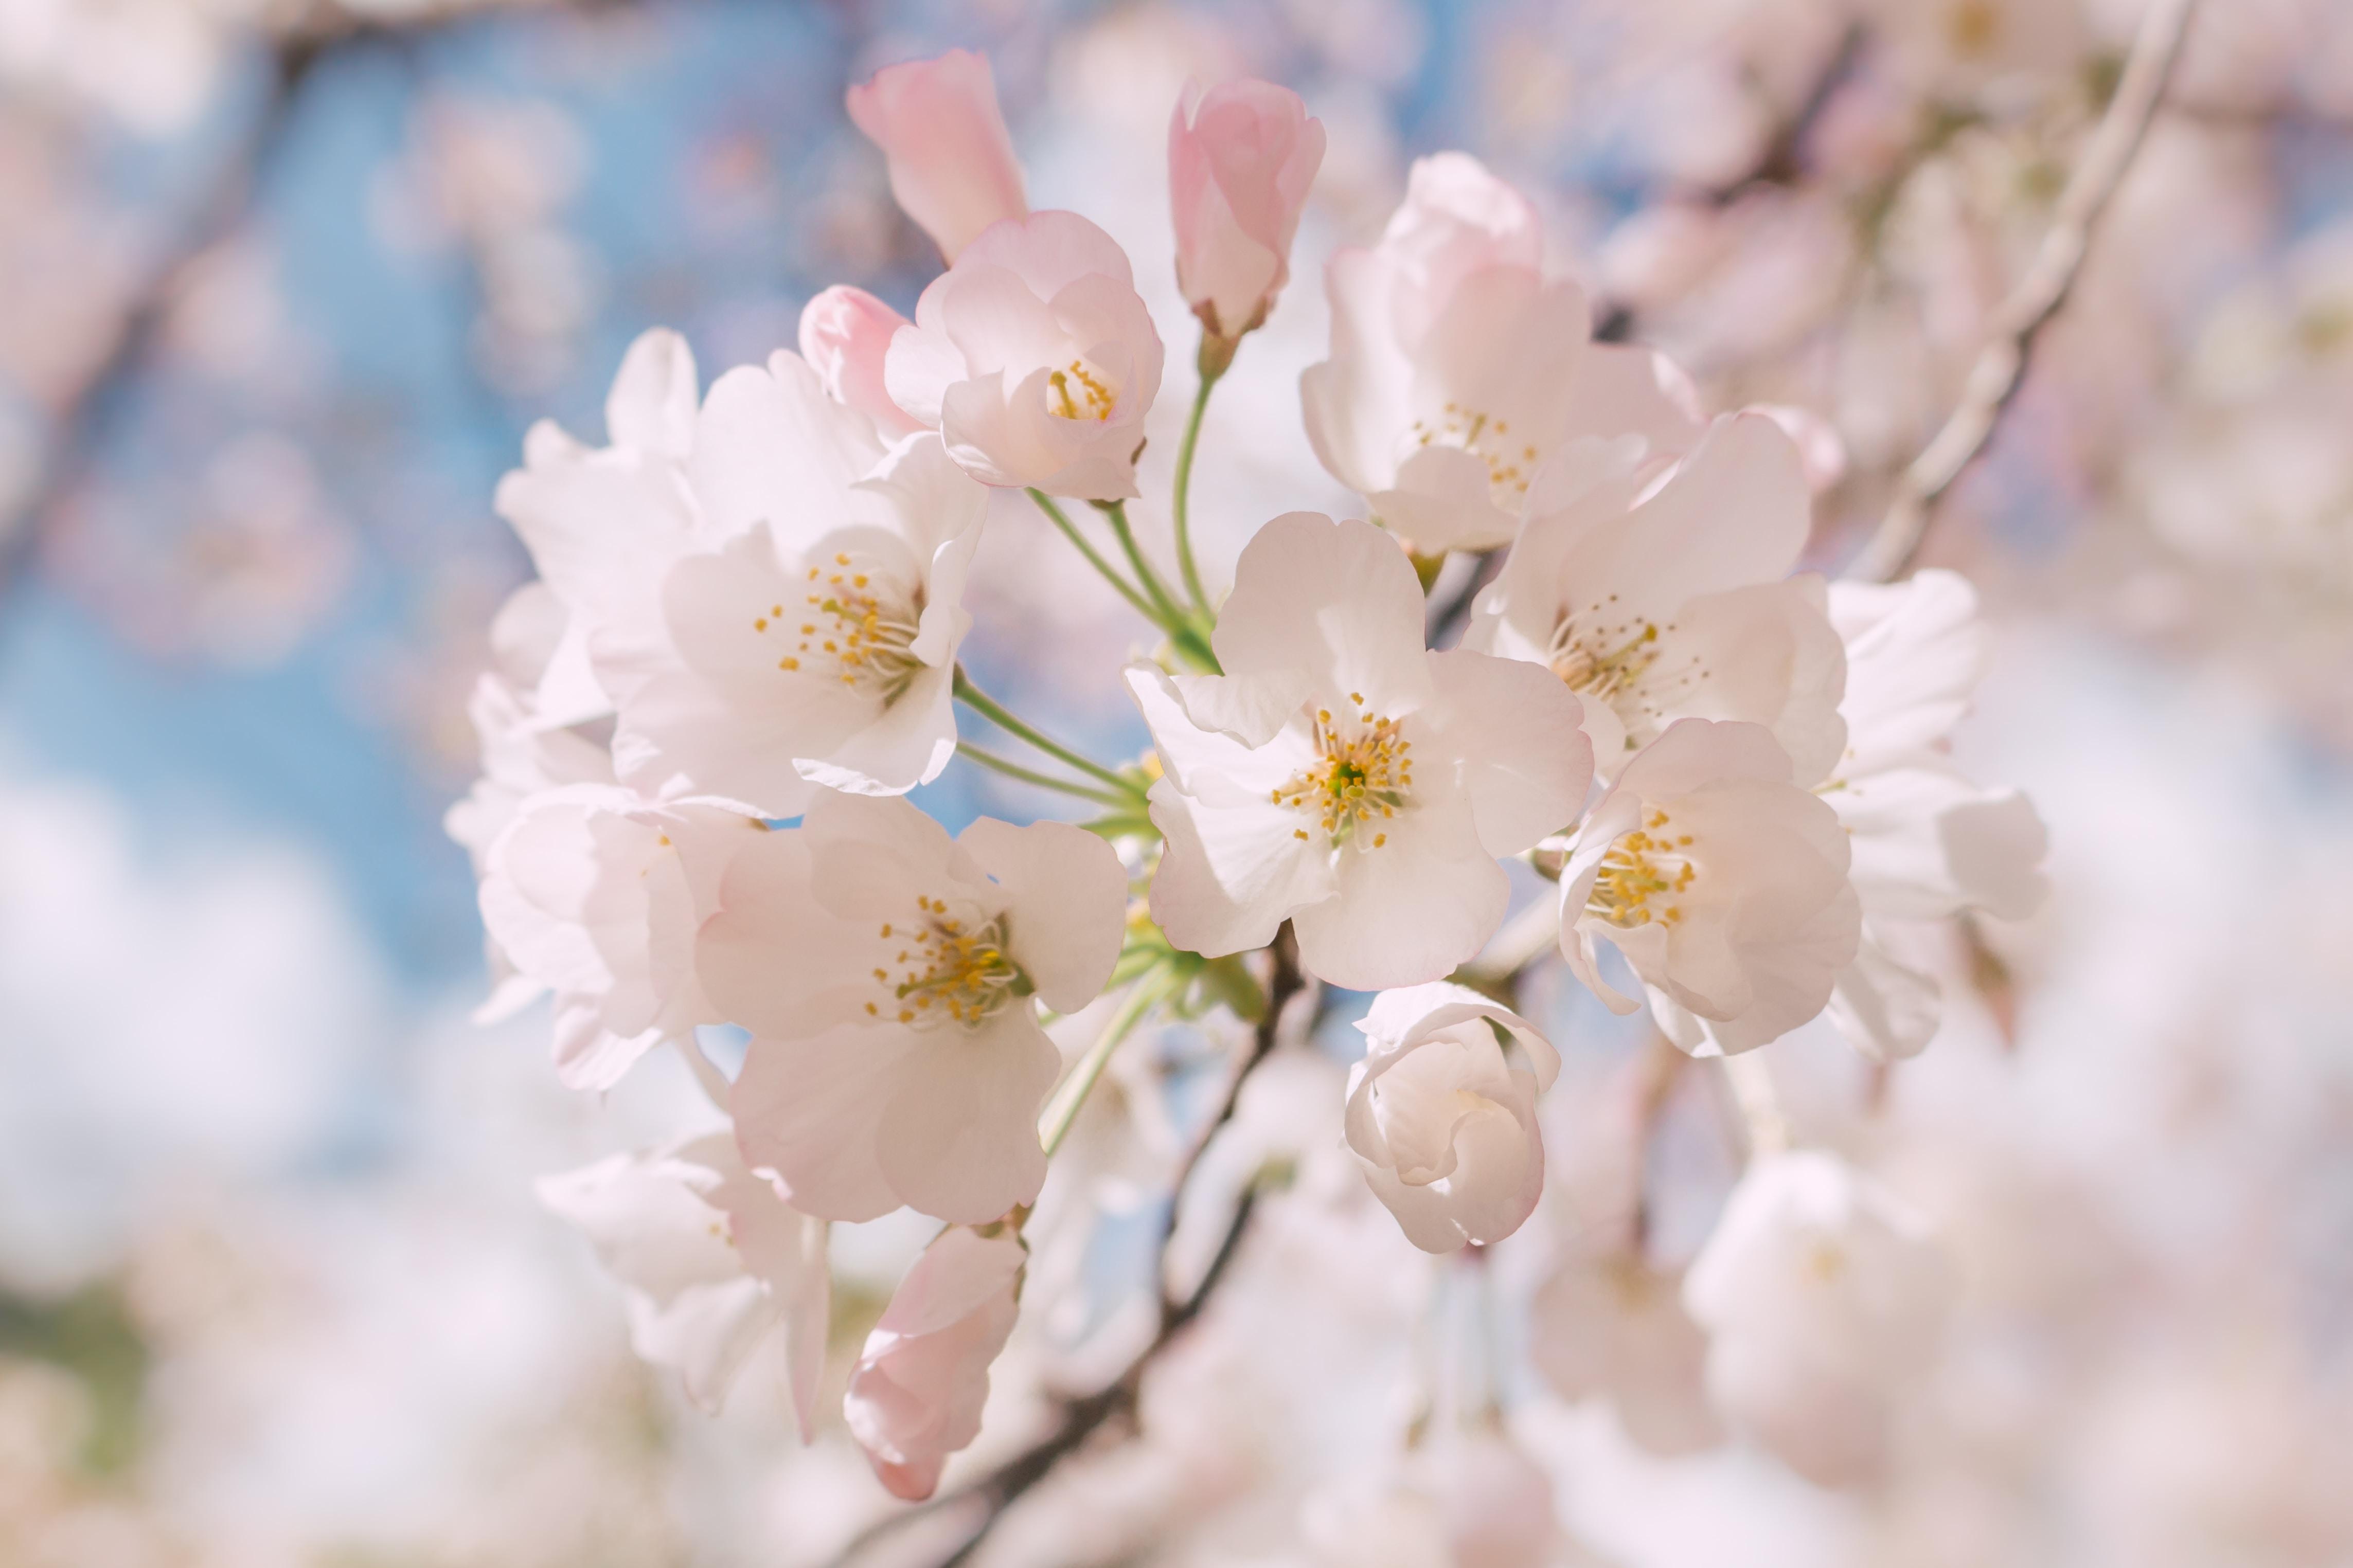 Macro of white blossom on branch in Spring, Elizabeth Gamble Garden